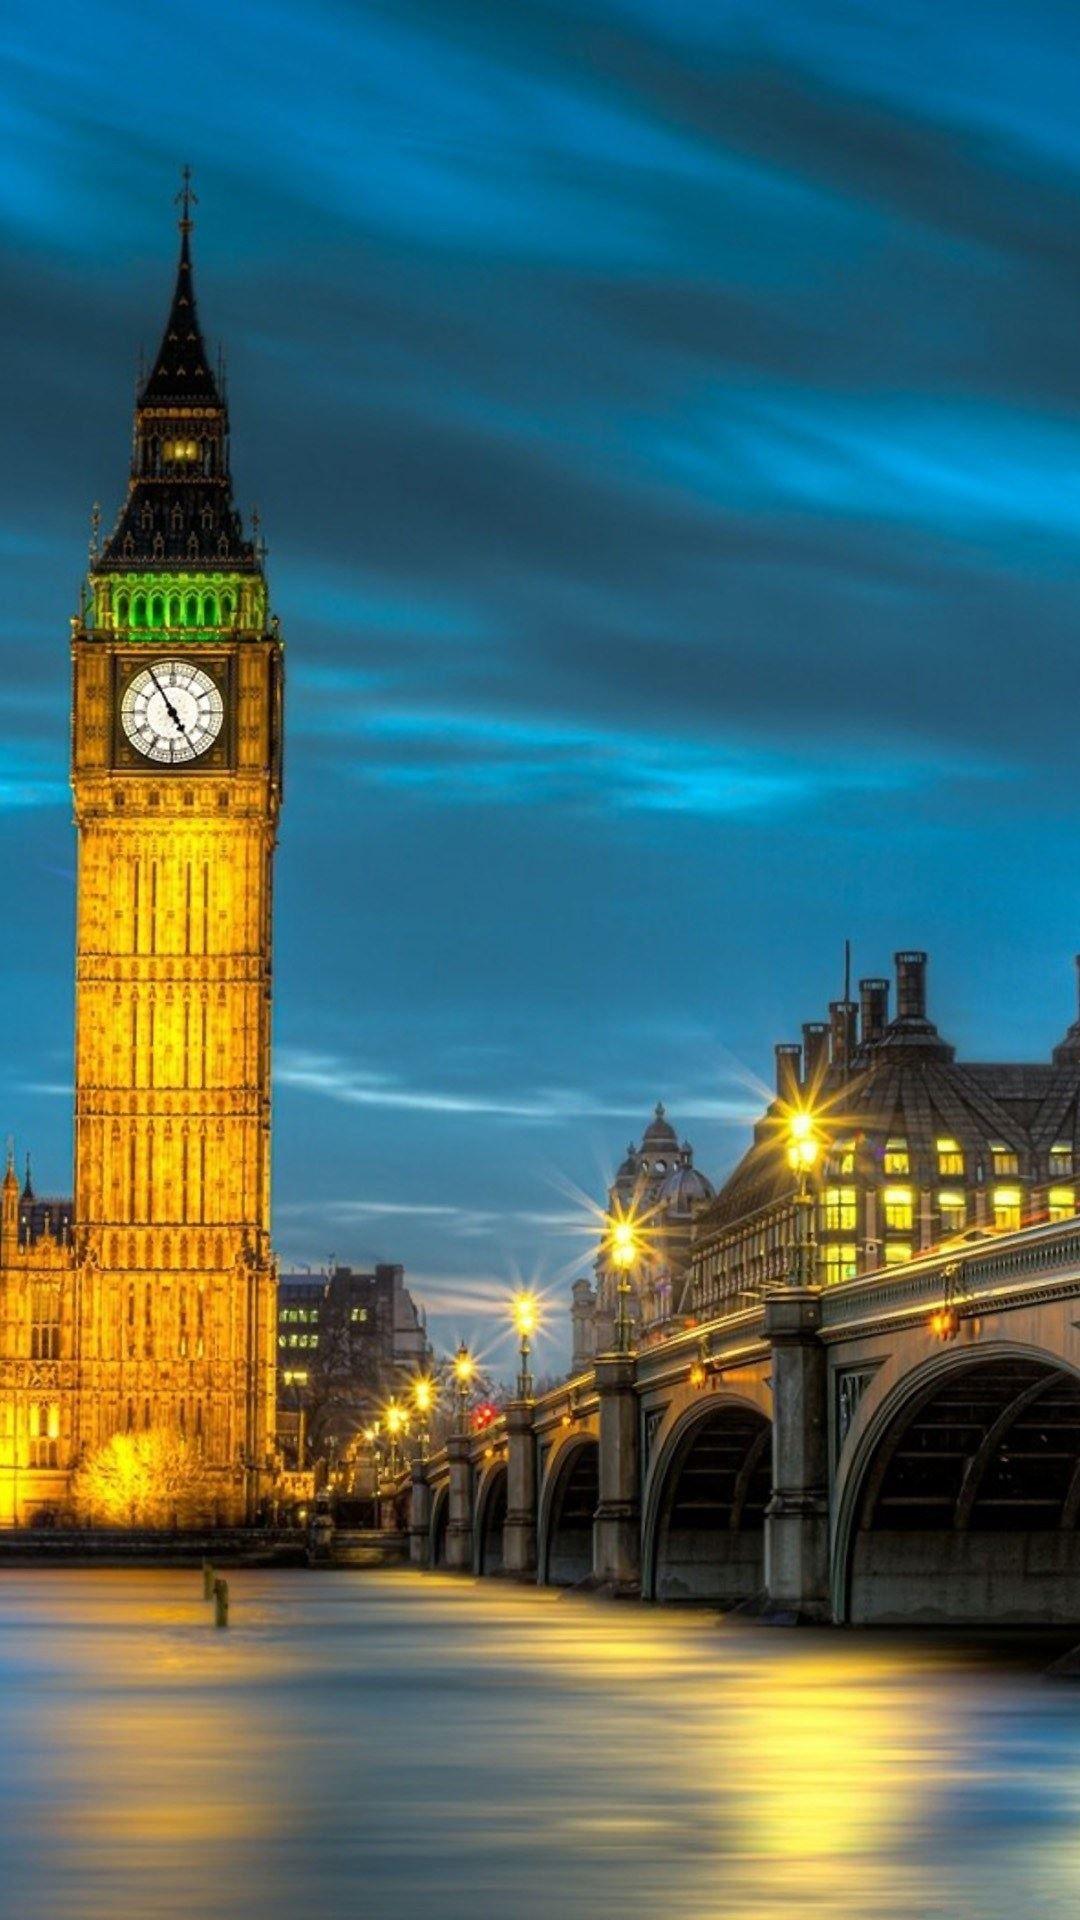 Iphone 6 Plus Wallpaper 1920x1080px 401ppi Big Ben London